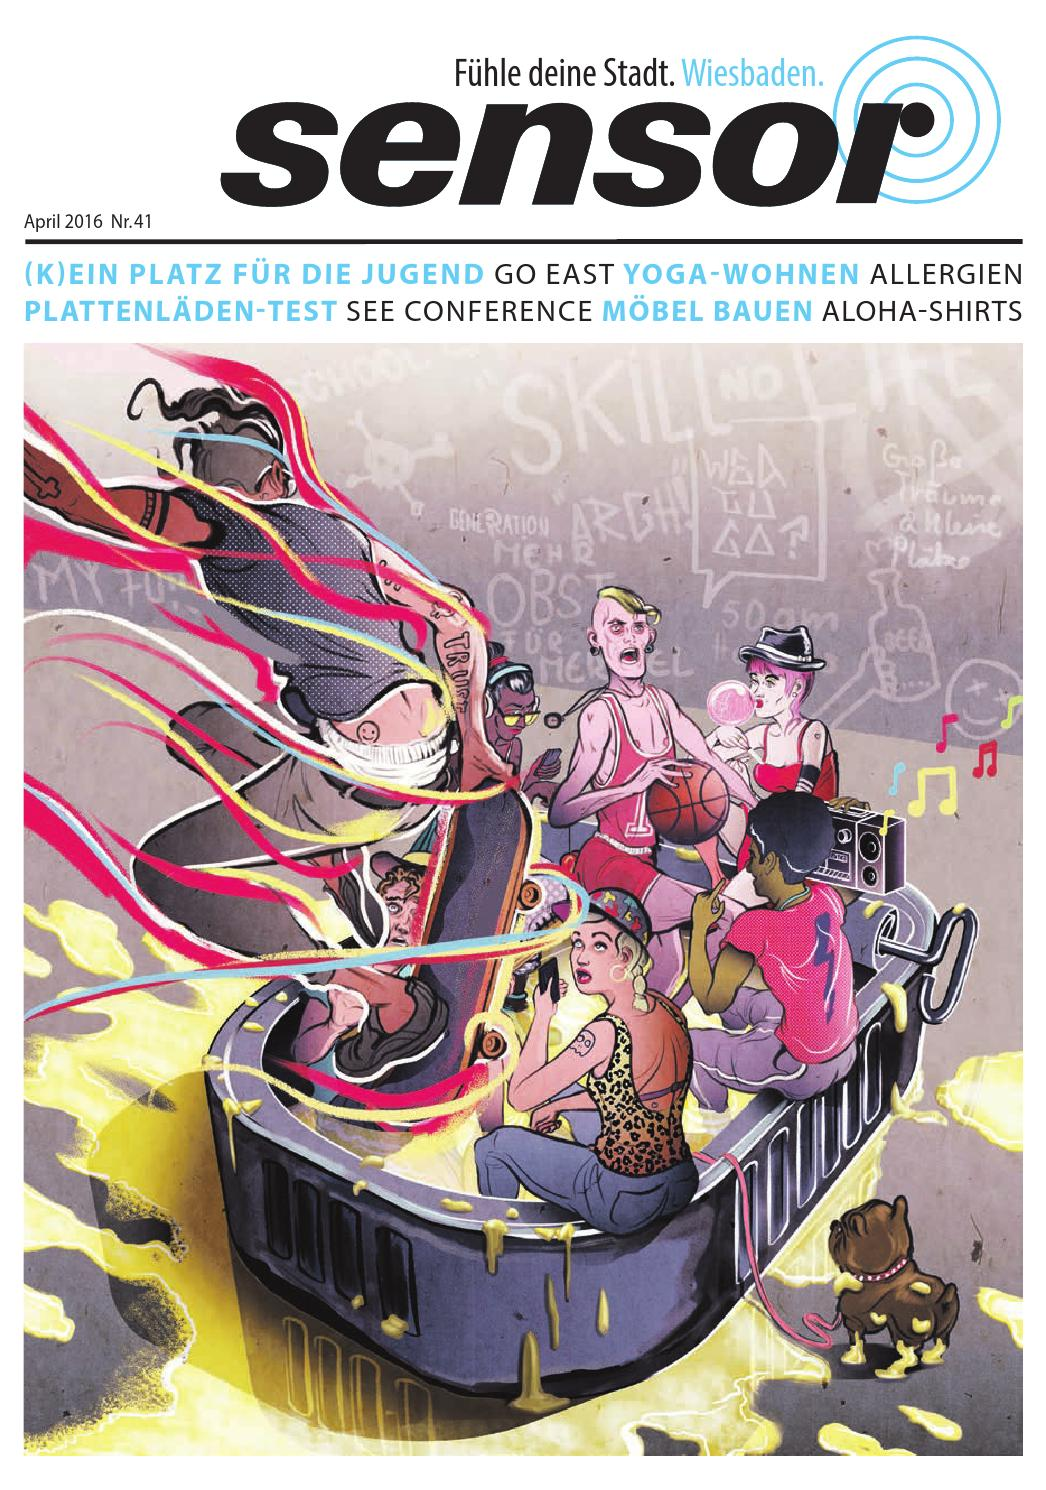 sensor wiesbaden 42 april 2016 by sensor magazin